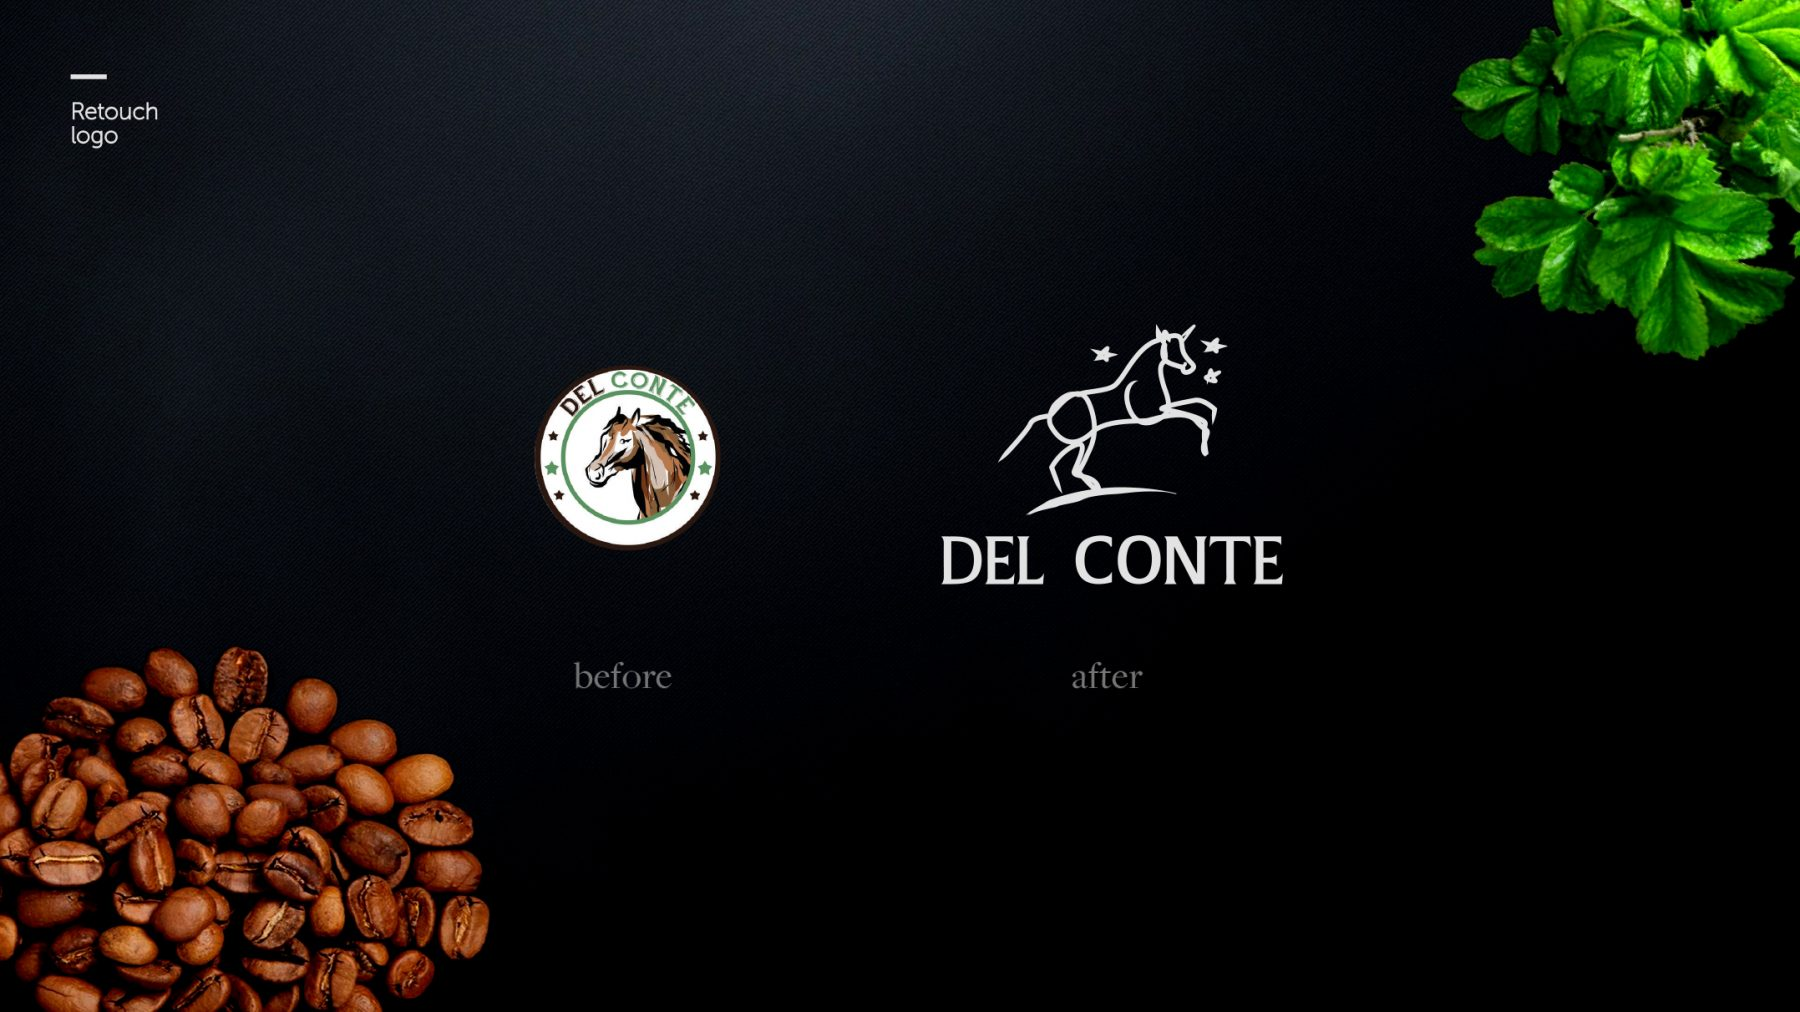 coffee, chocolate, fruit & lemon tea, milk powder, BroHouse, Del Conte, branding,Packaging, logo, pencil drawing style, packs, Oane, Florin , Bostina, reputation, illustration, draw, concept, audit